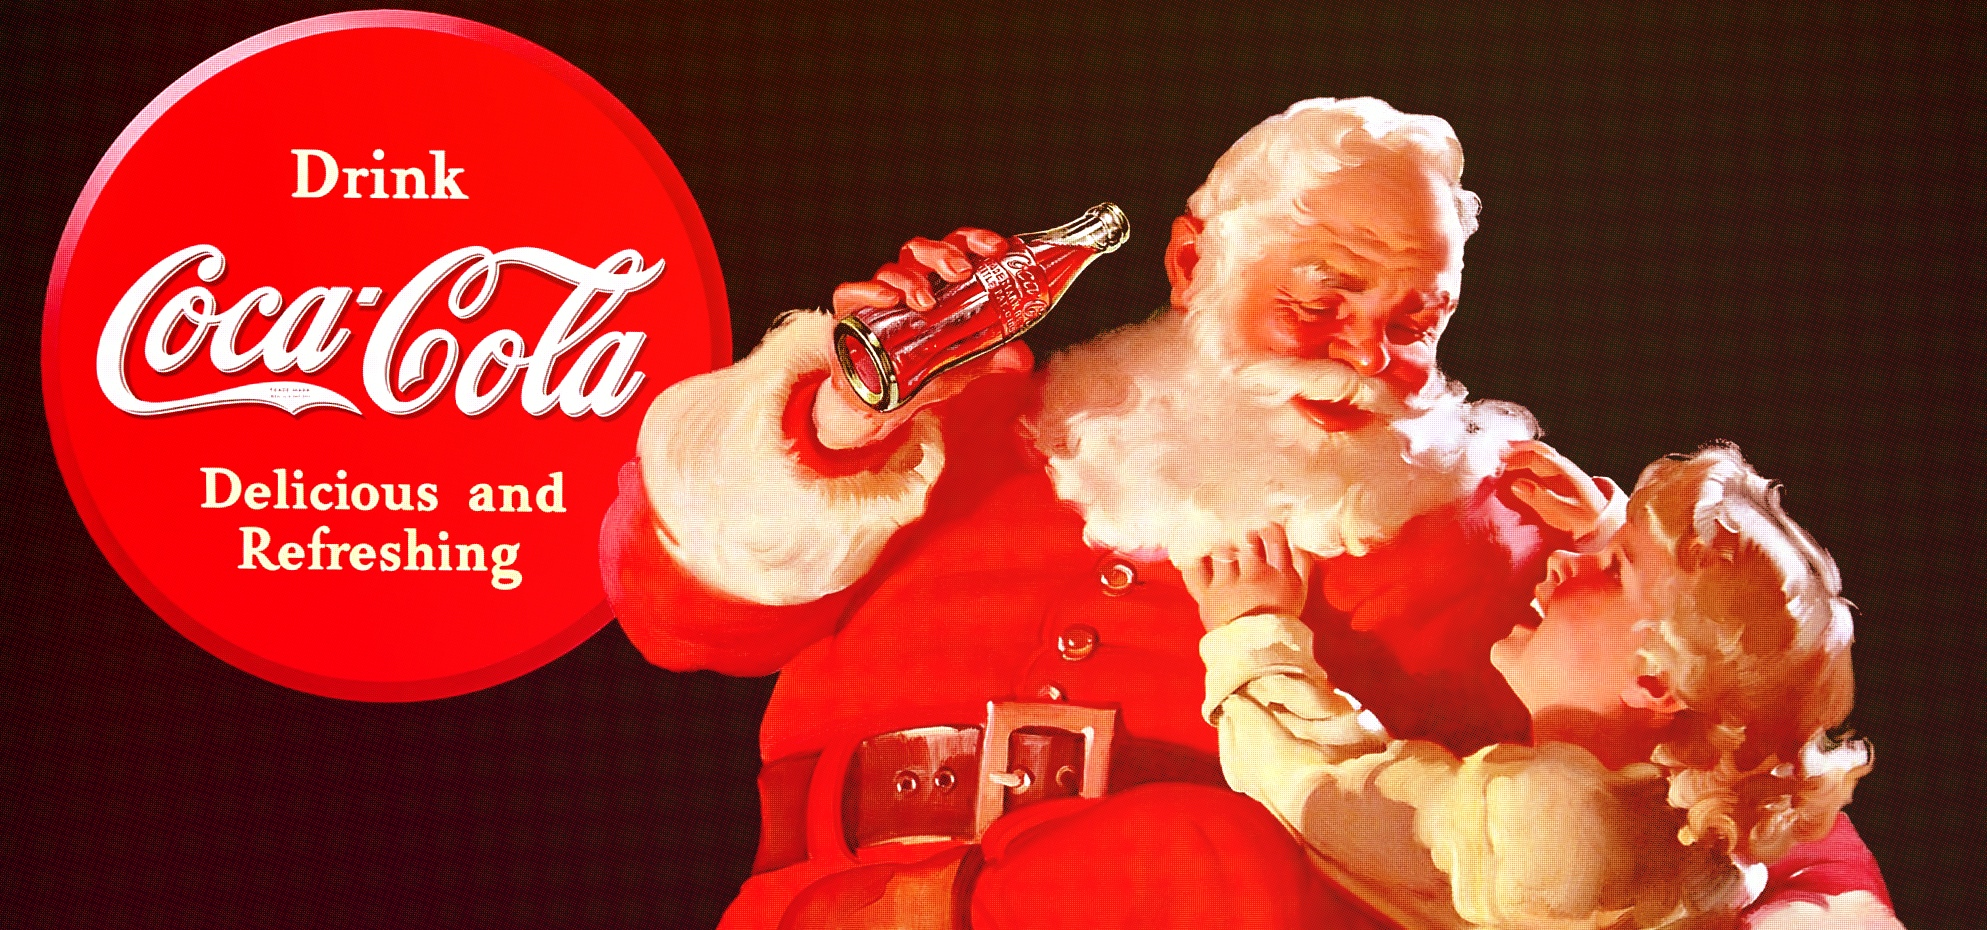 Weihnachtsmann Coke